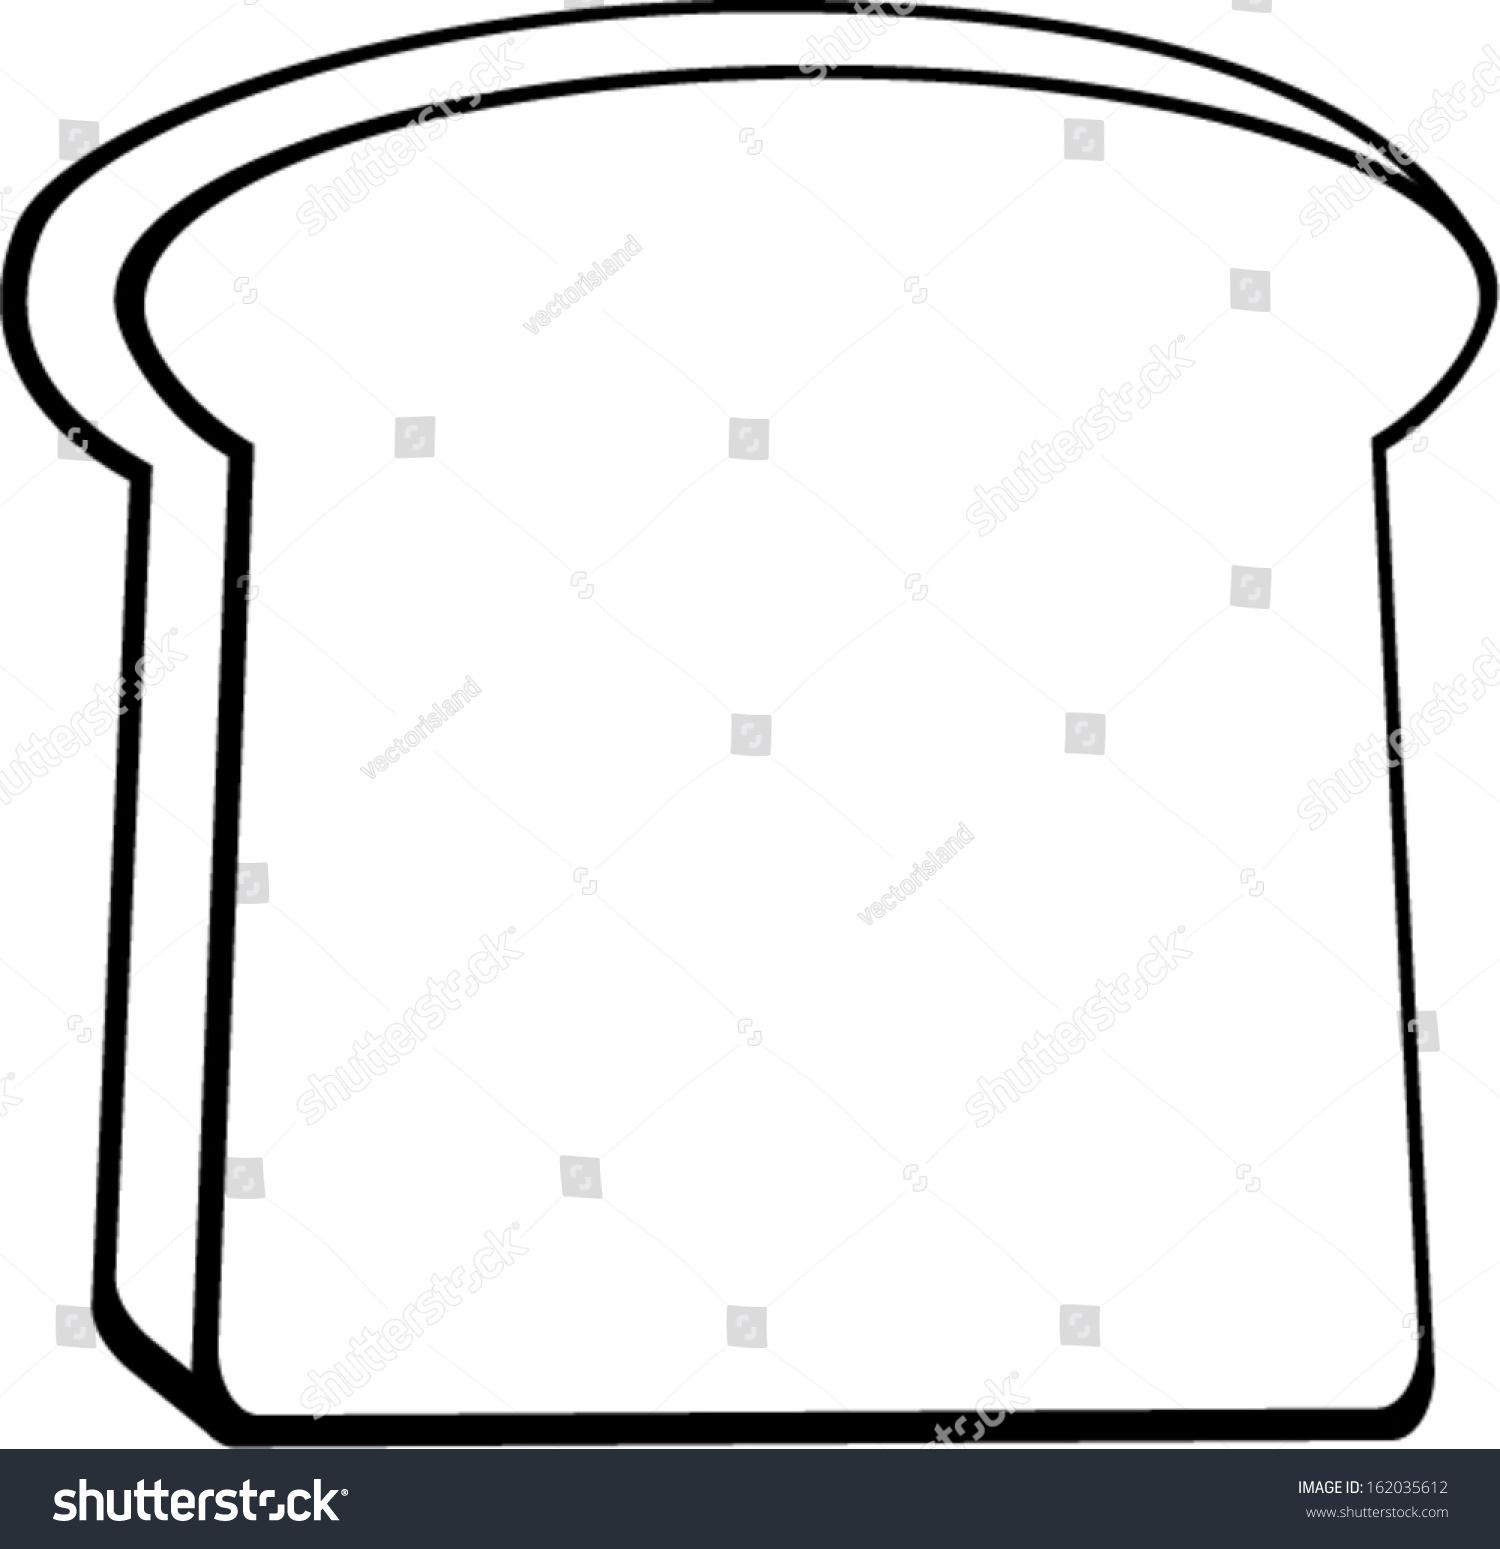 Slice Of Bread Outline.